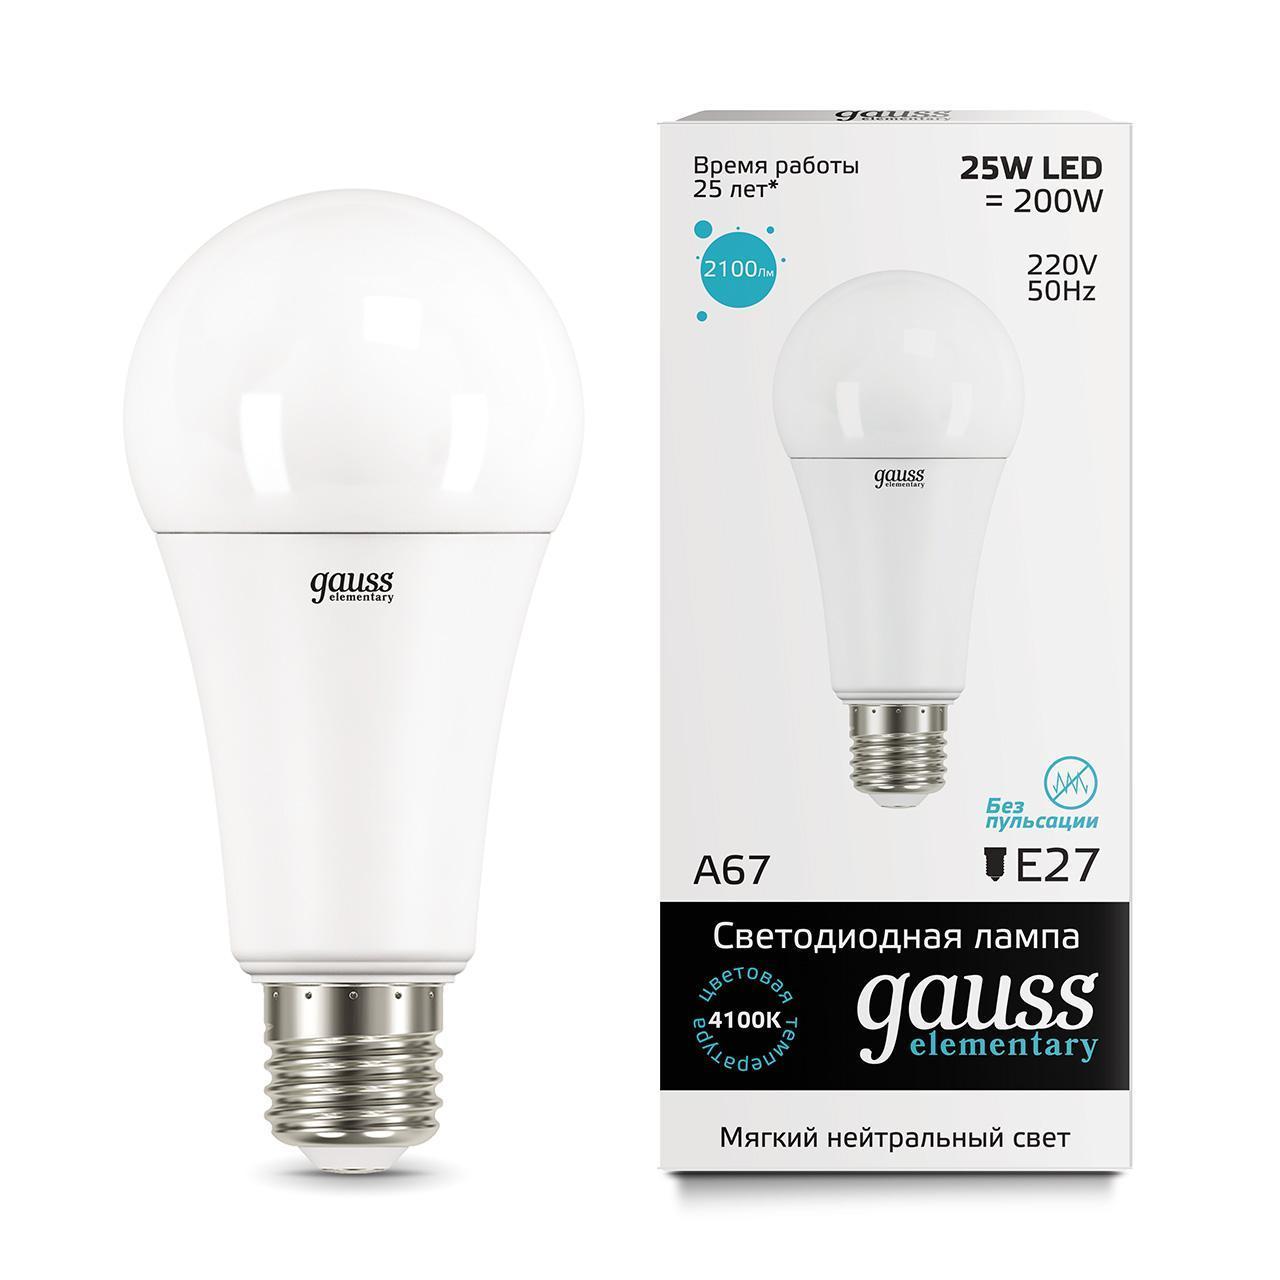 Лампа светодиодная E27 25W 4100K матовая 73225 цена и фото